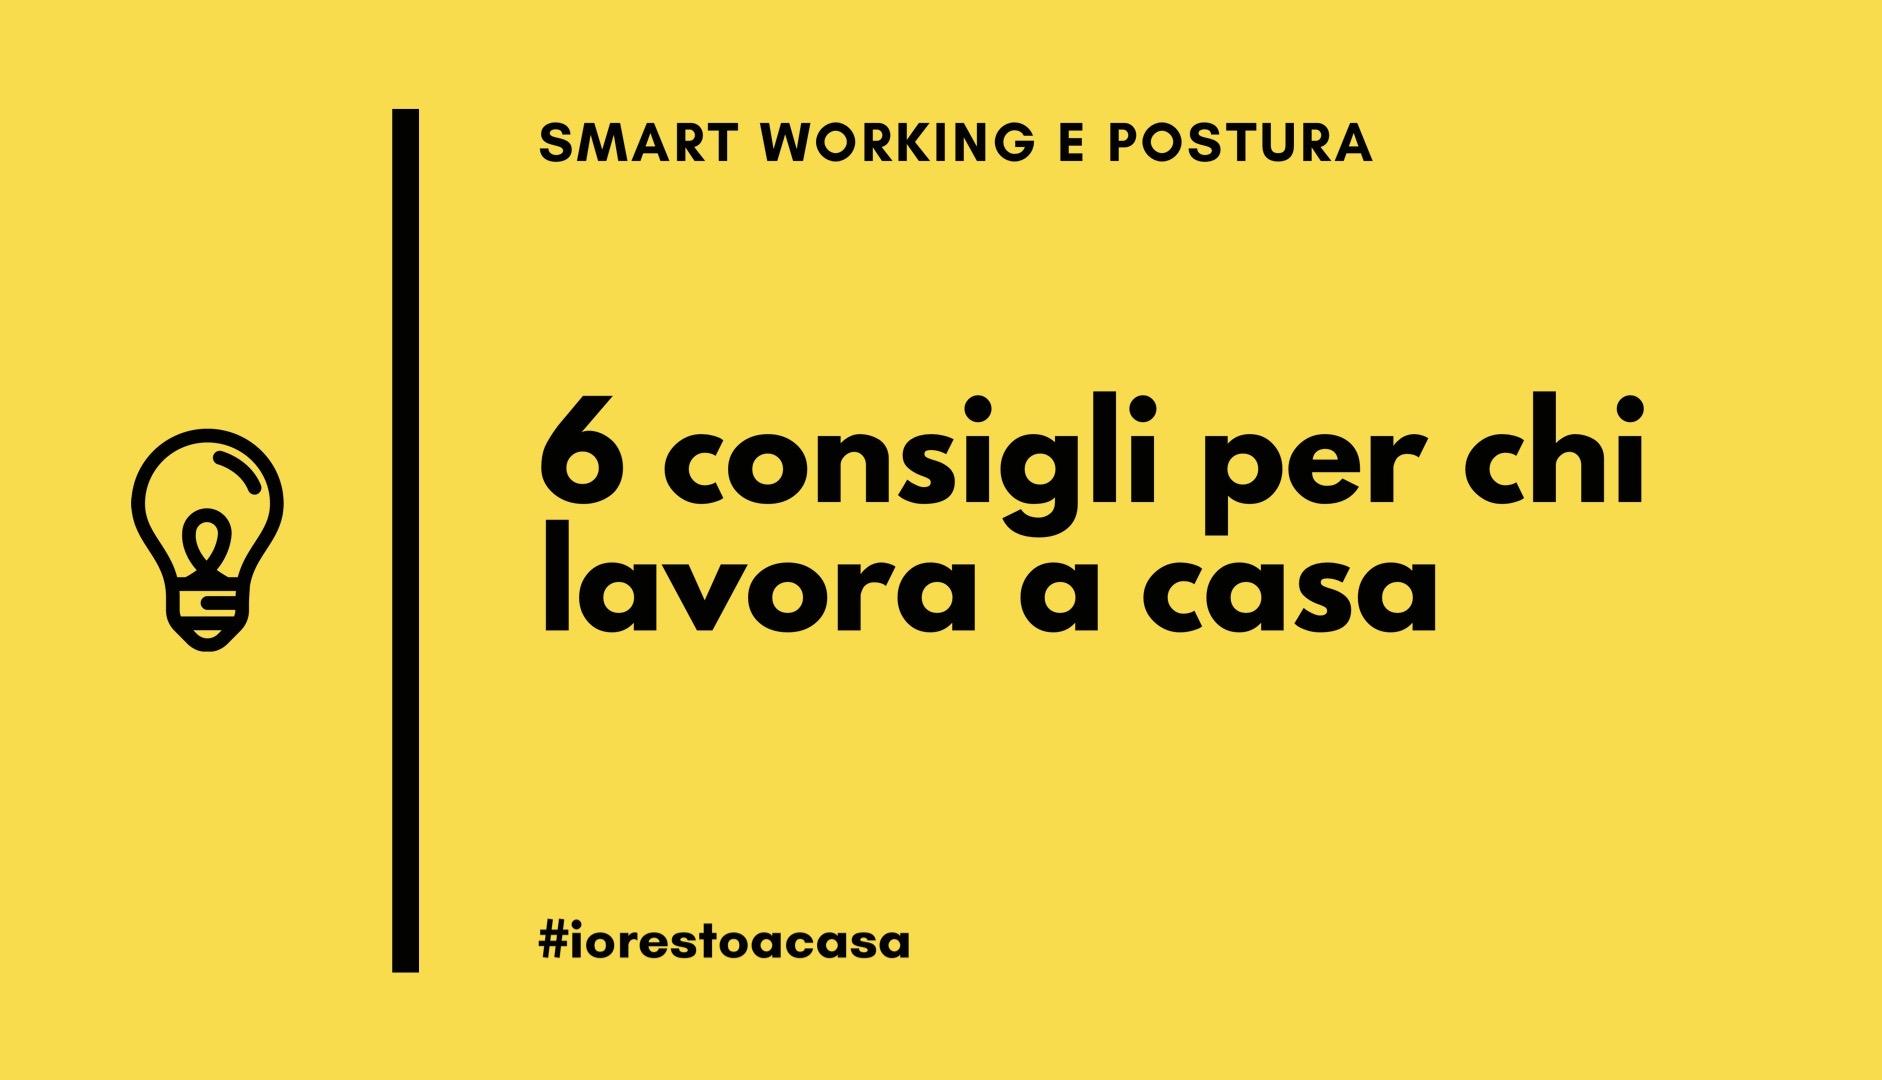 Smart working e postura. 6 consigli utili